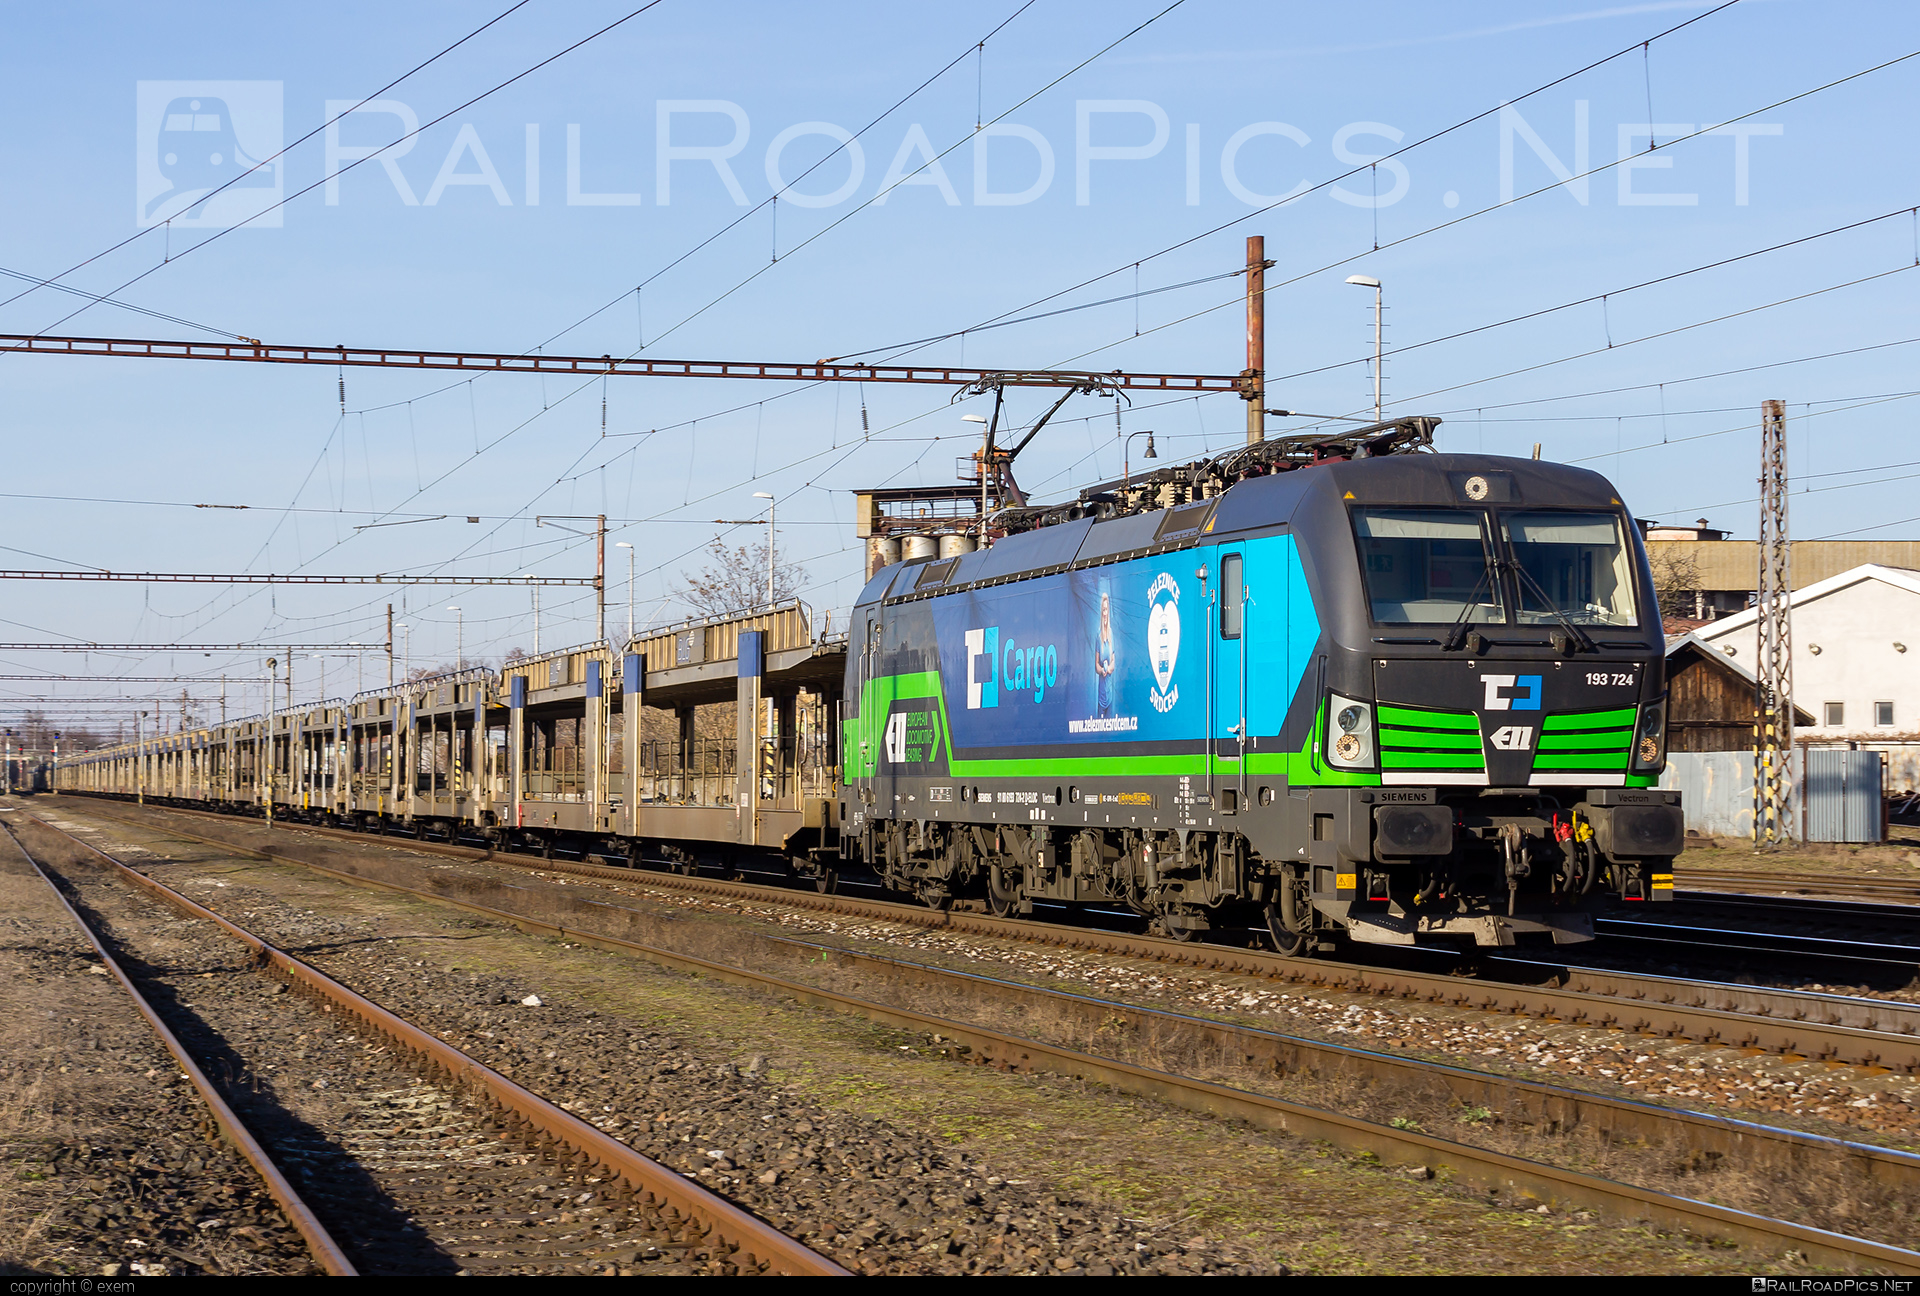 Siemens Vectron MS - 193 724 operated by Železničná Spoločnost' Cargo Slovakia a.s. #ZeleznicnaSpolocnostCargoSlovakia #carcarrierwagon #cdcargo #ell #ellgermany #eloc #europeanlocomotiveleasing #siemens #siemensvectron #siemensvectronms #vectron #vectronms #zsskcargo